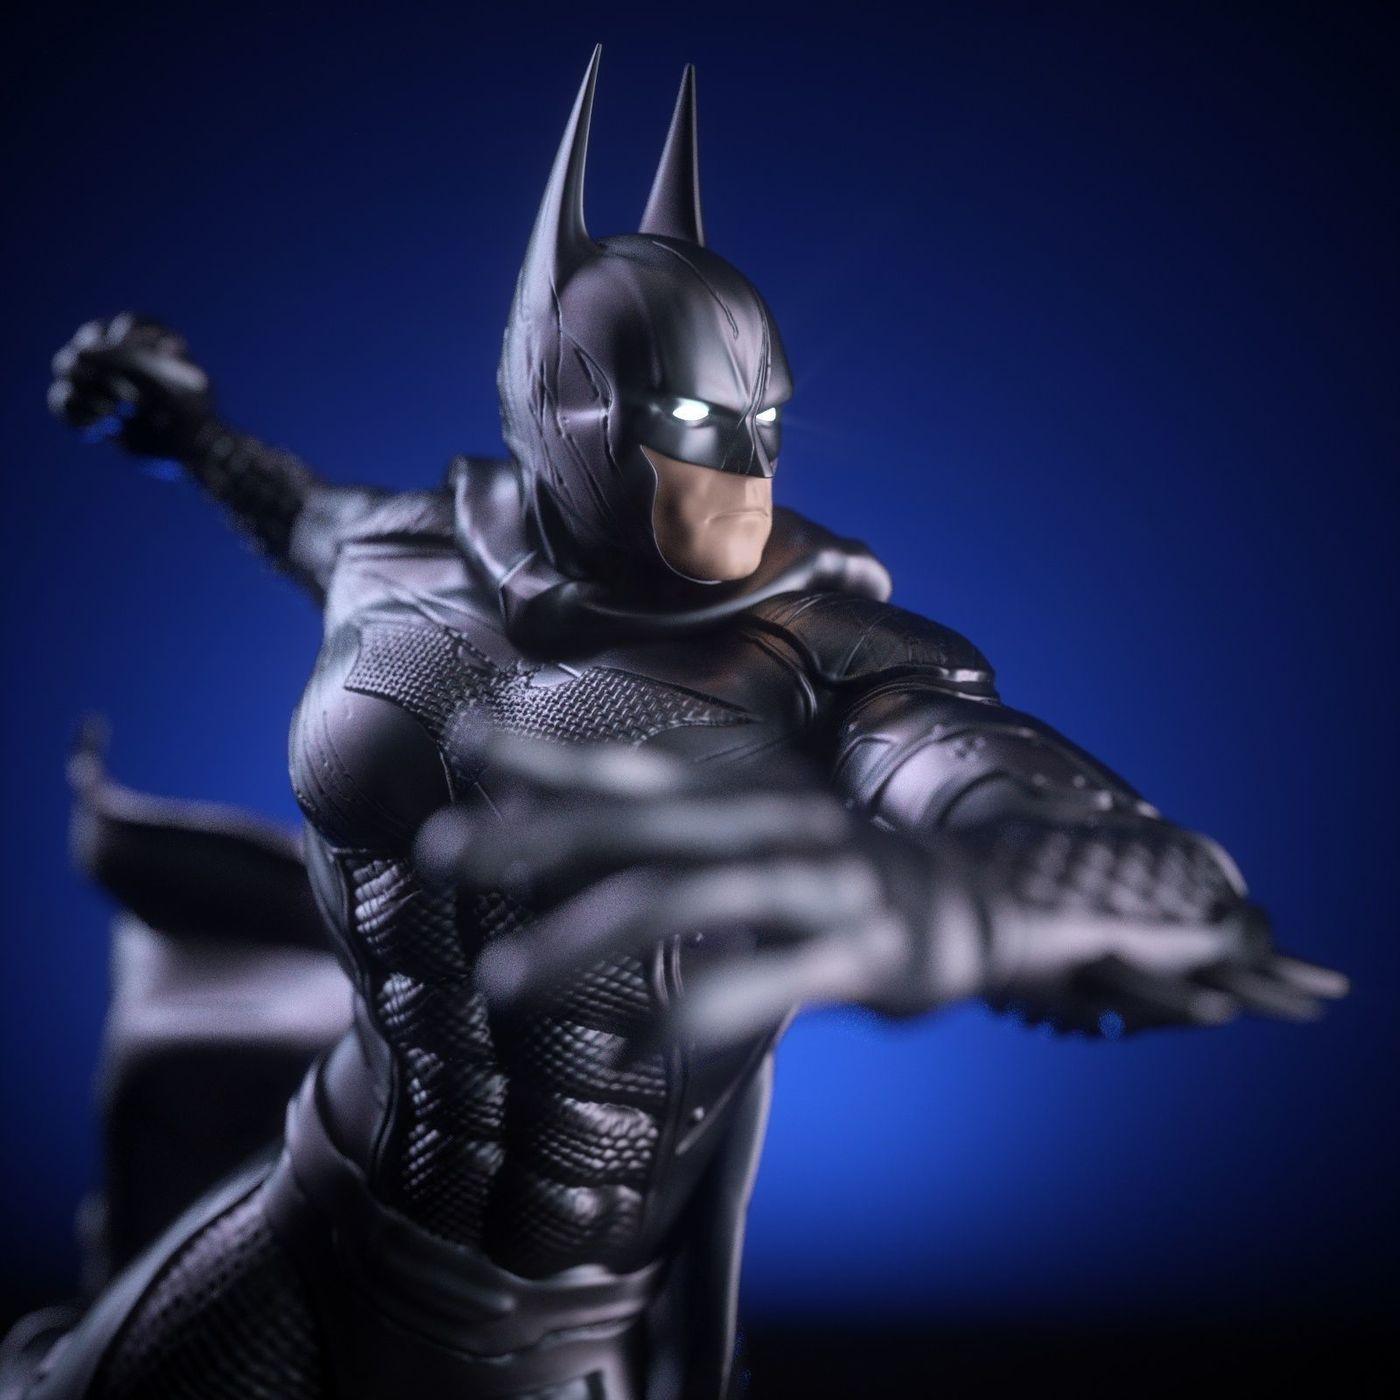 Batman Battle Pose